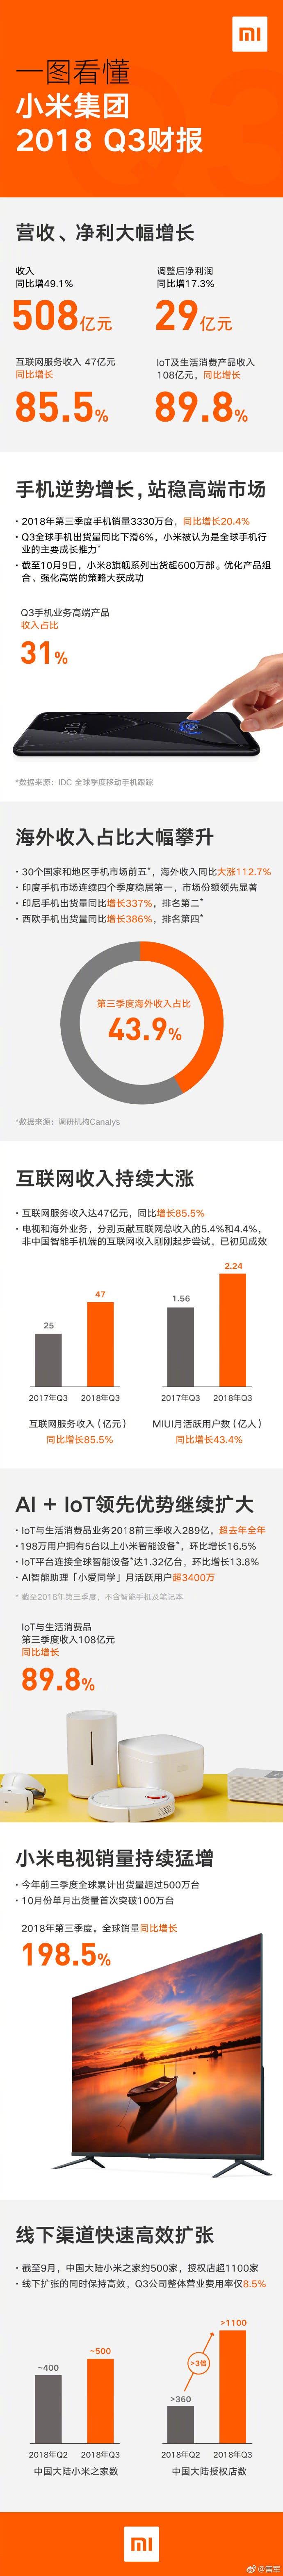 Xiaomi report for Q3 2018